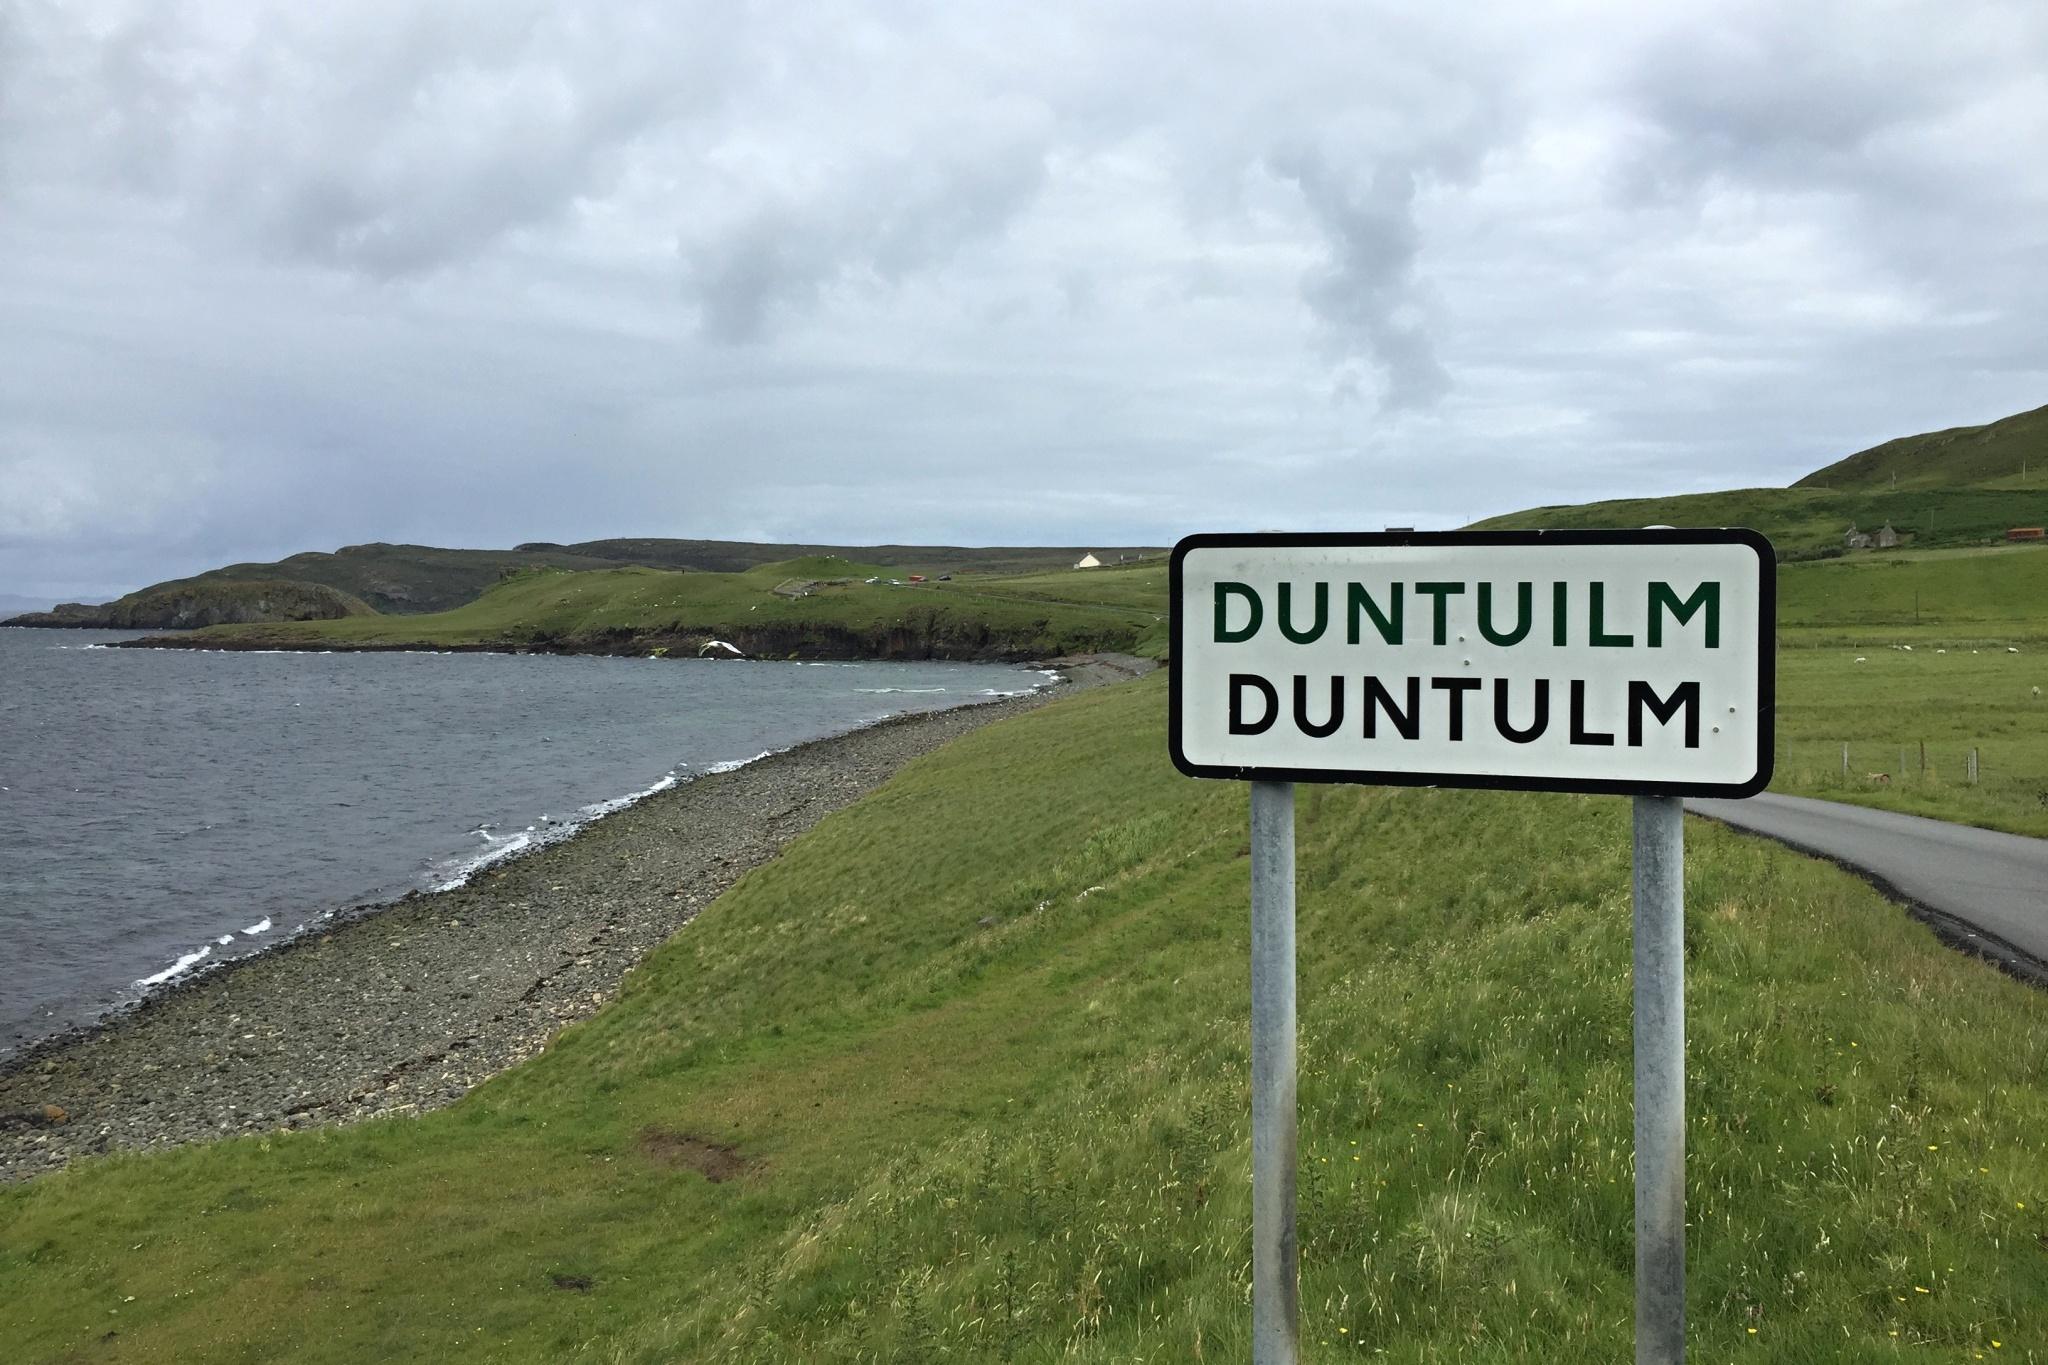 Vesnice Duntulm